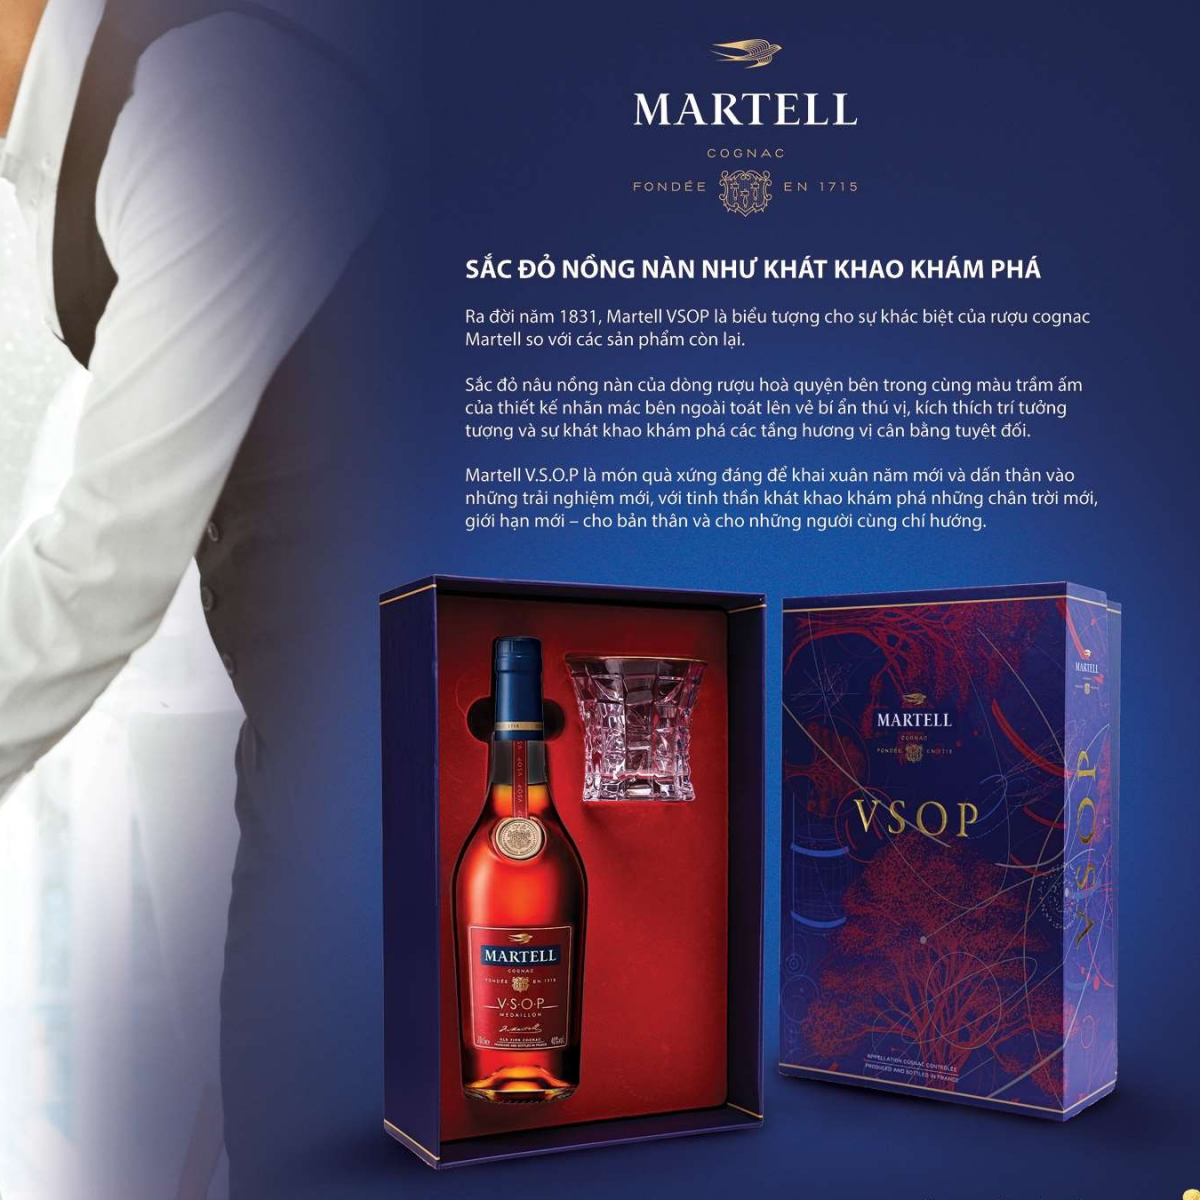 Martell VSOP - Hộp Quà Tết 2020